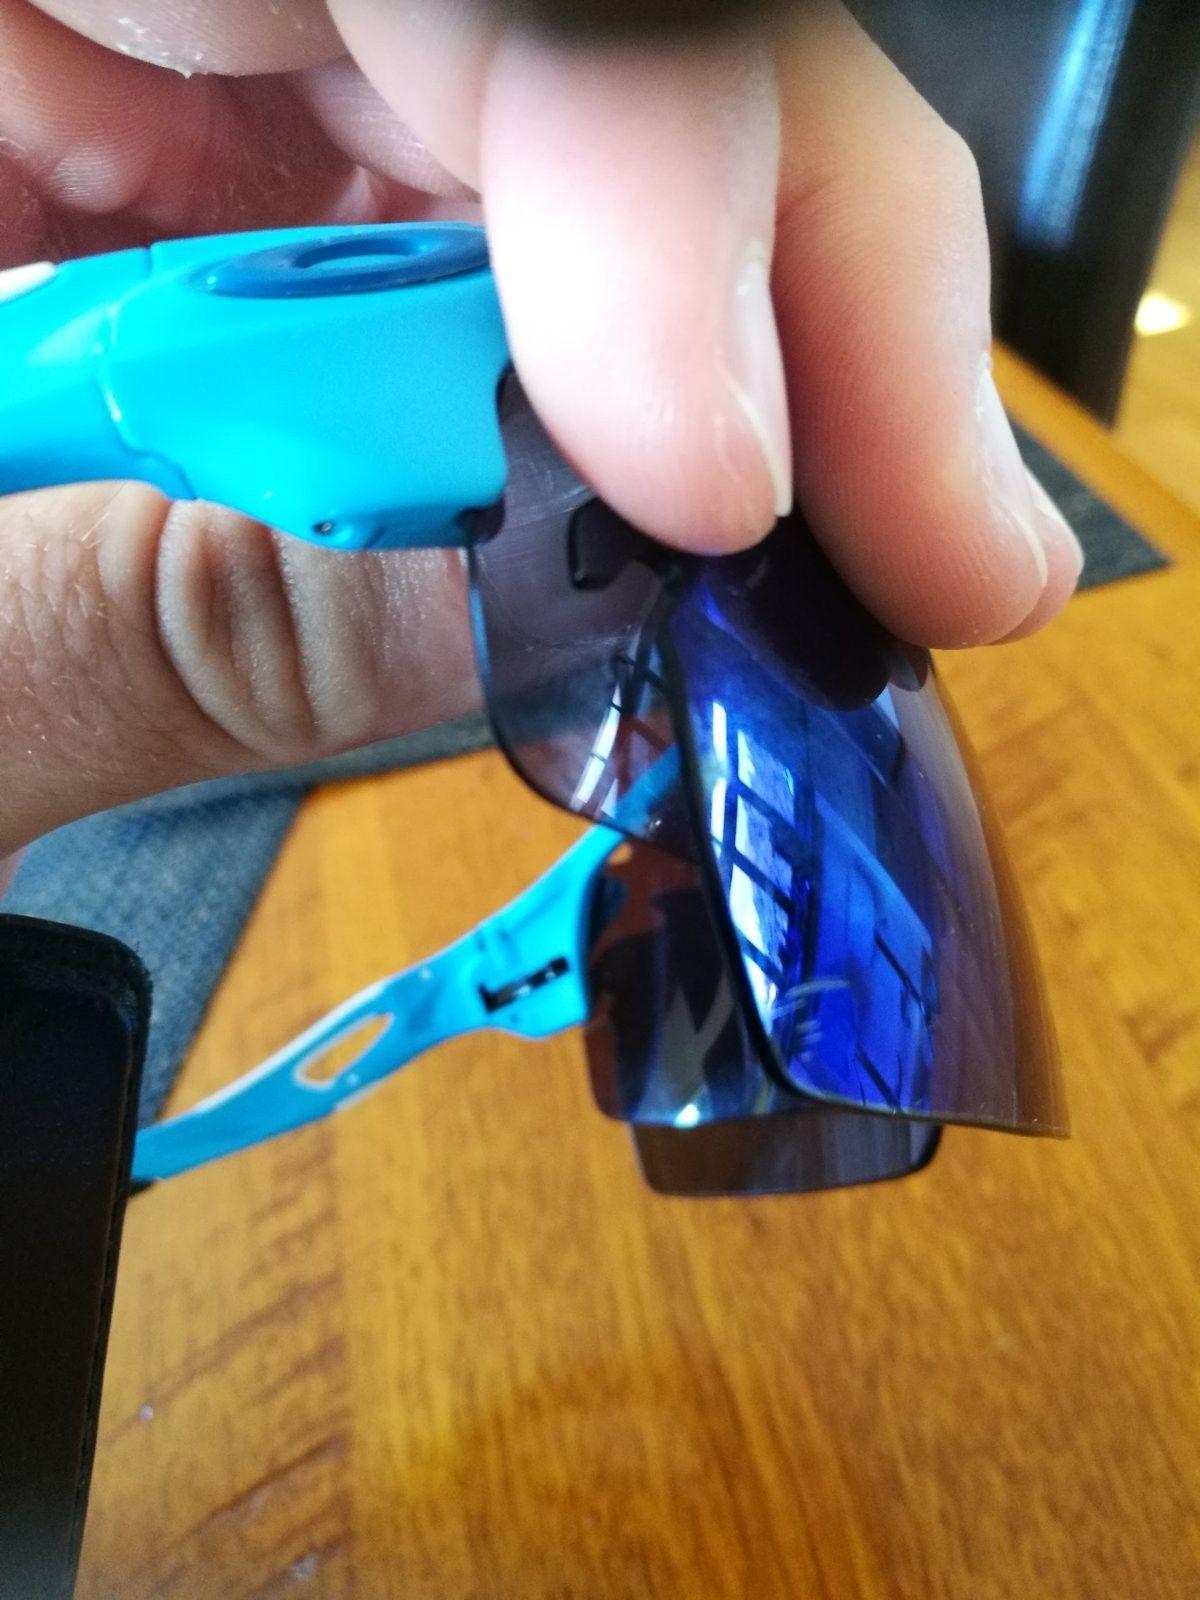 Radarlock XL Glacier blue help!: Not sure if Authentic or not - IMG_20160720_134715.jpg